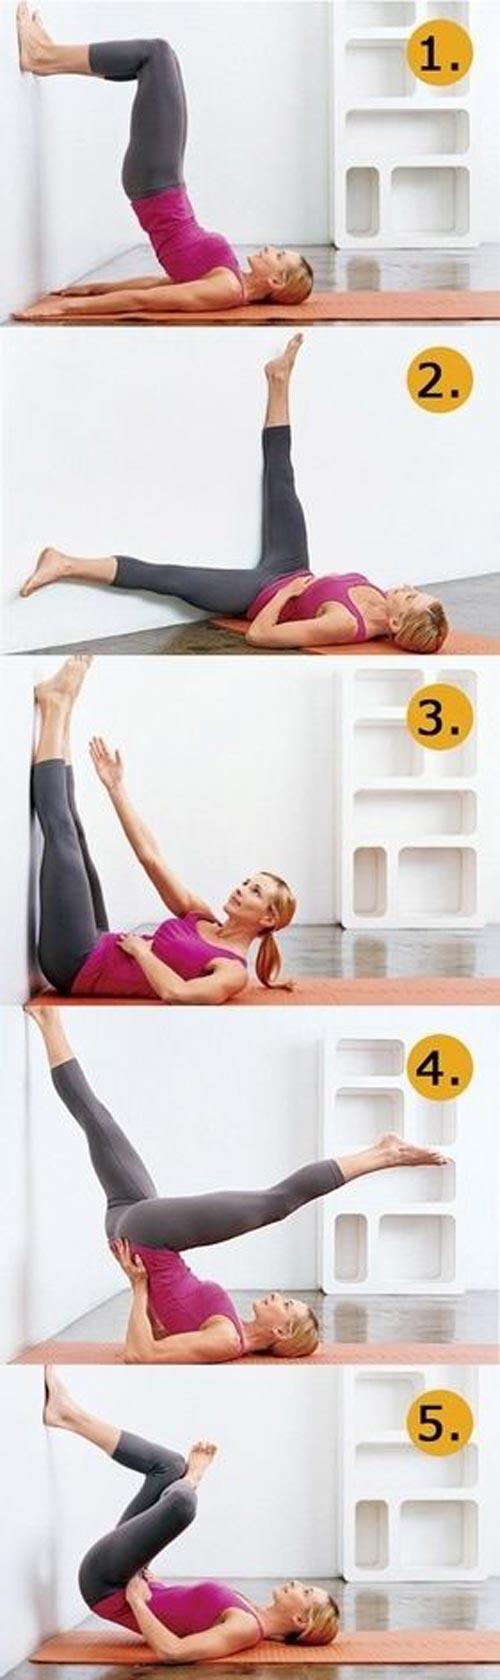 yoga-12-12-6